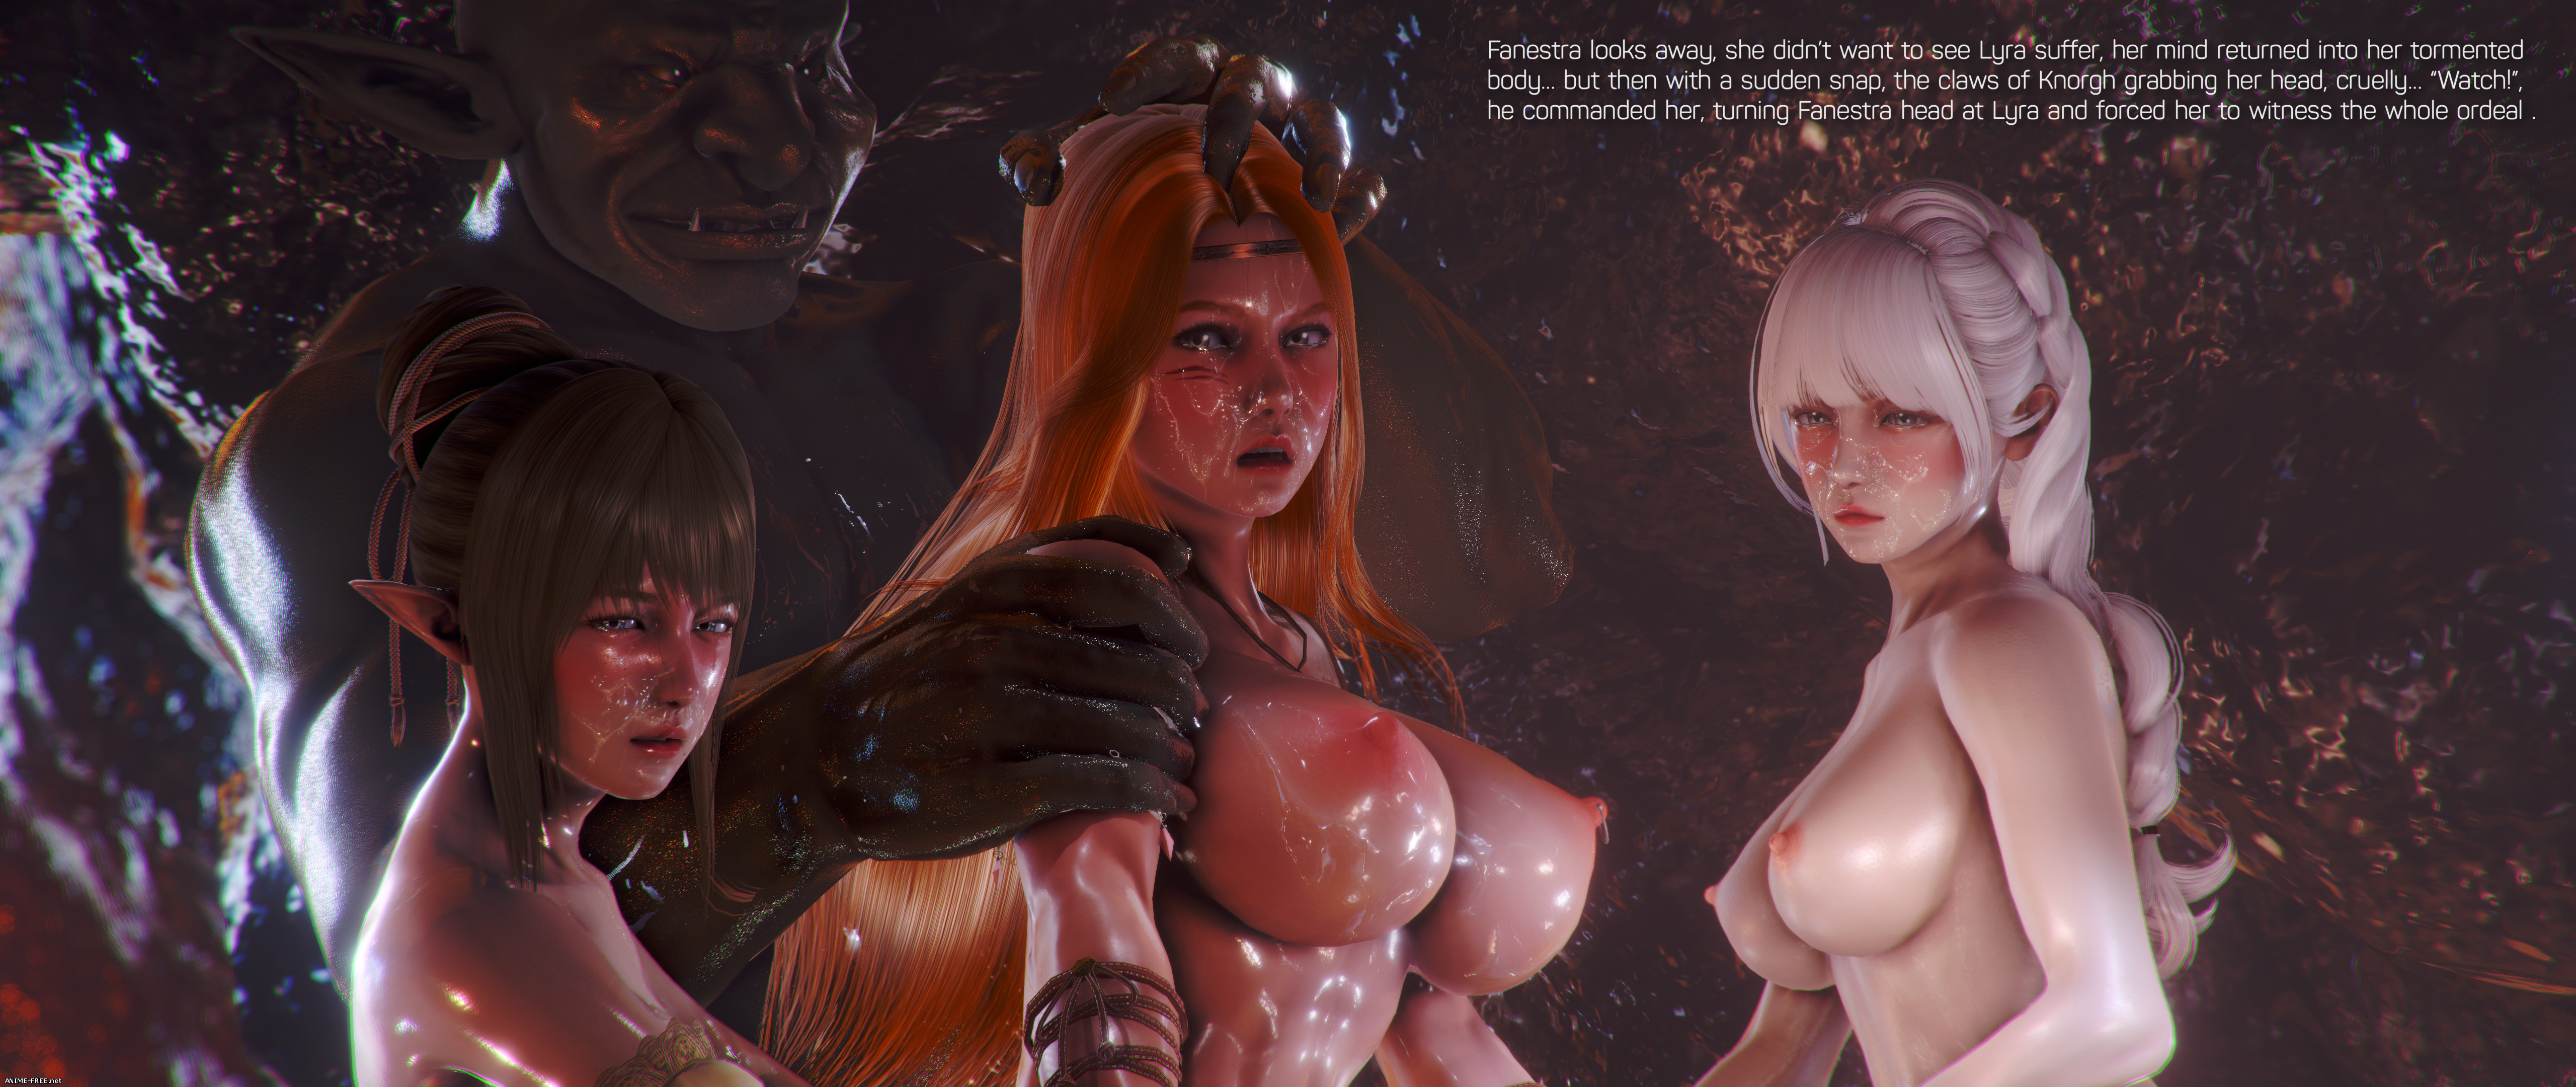 The Ultimate Series [Uncen] [3DCG] [ENG] Porn Comics